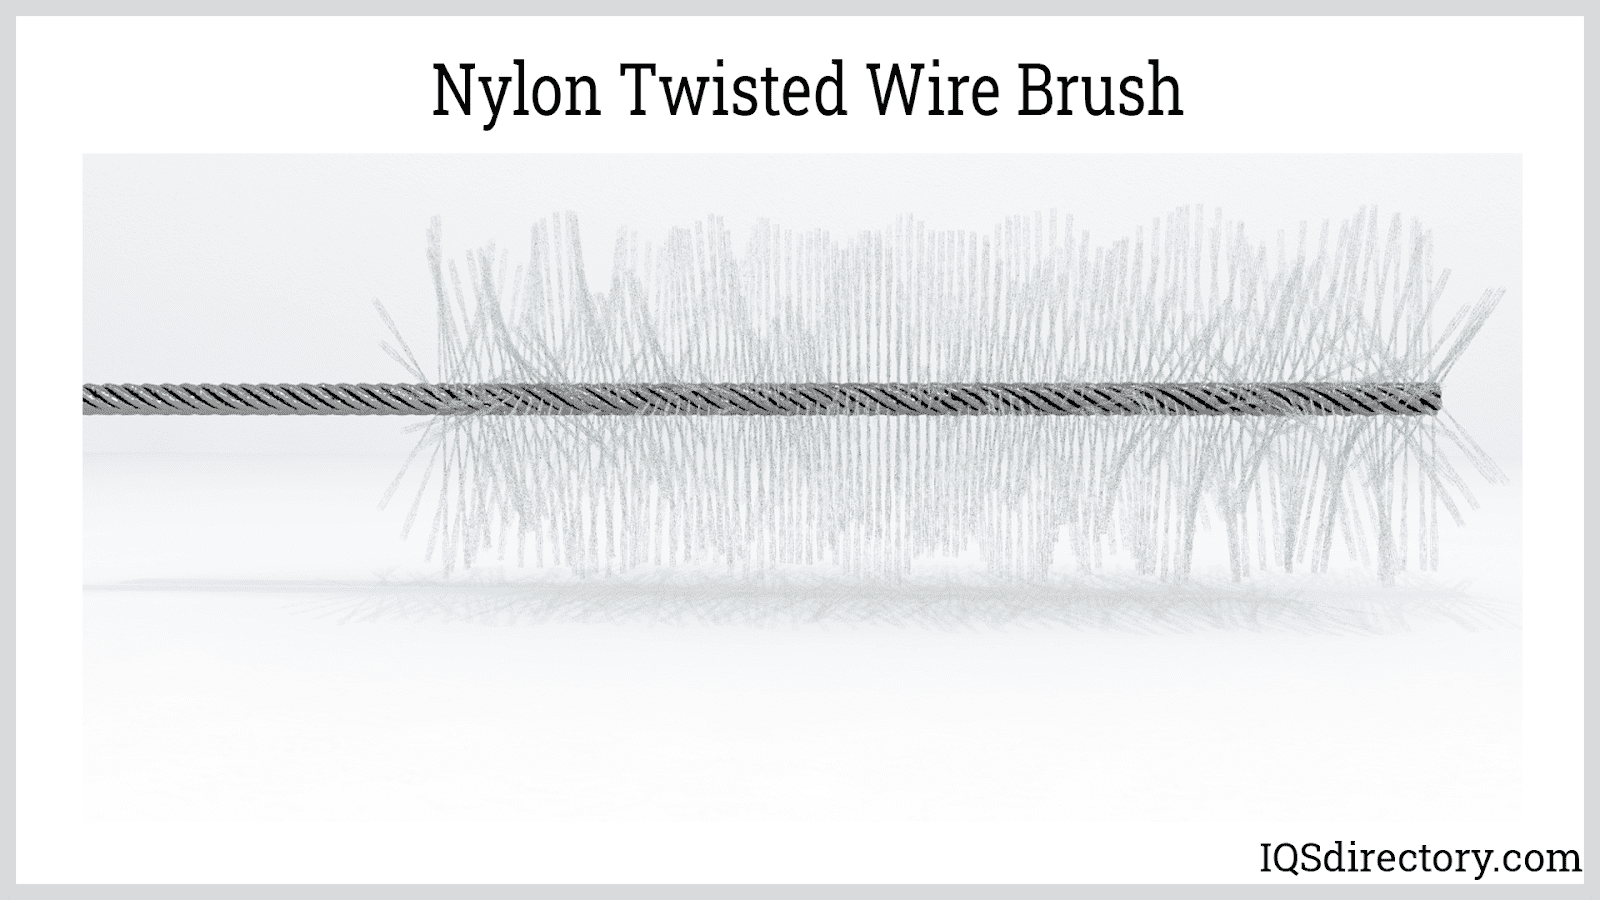 Nylon Twisted Wire Brush